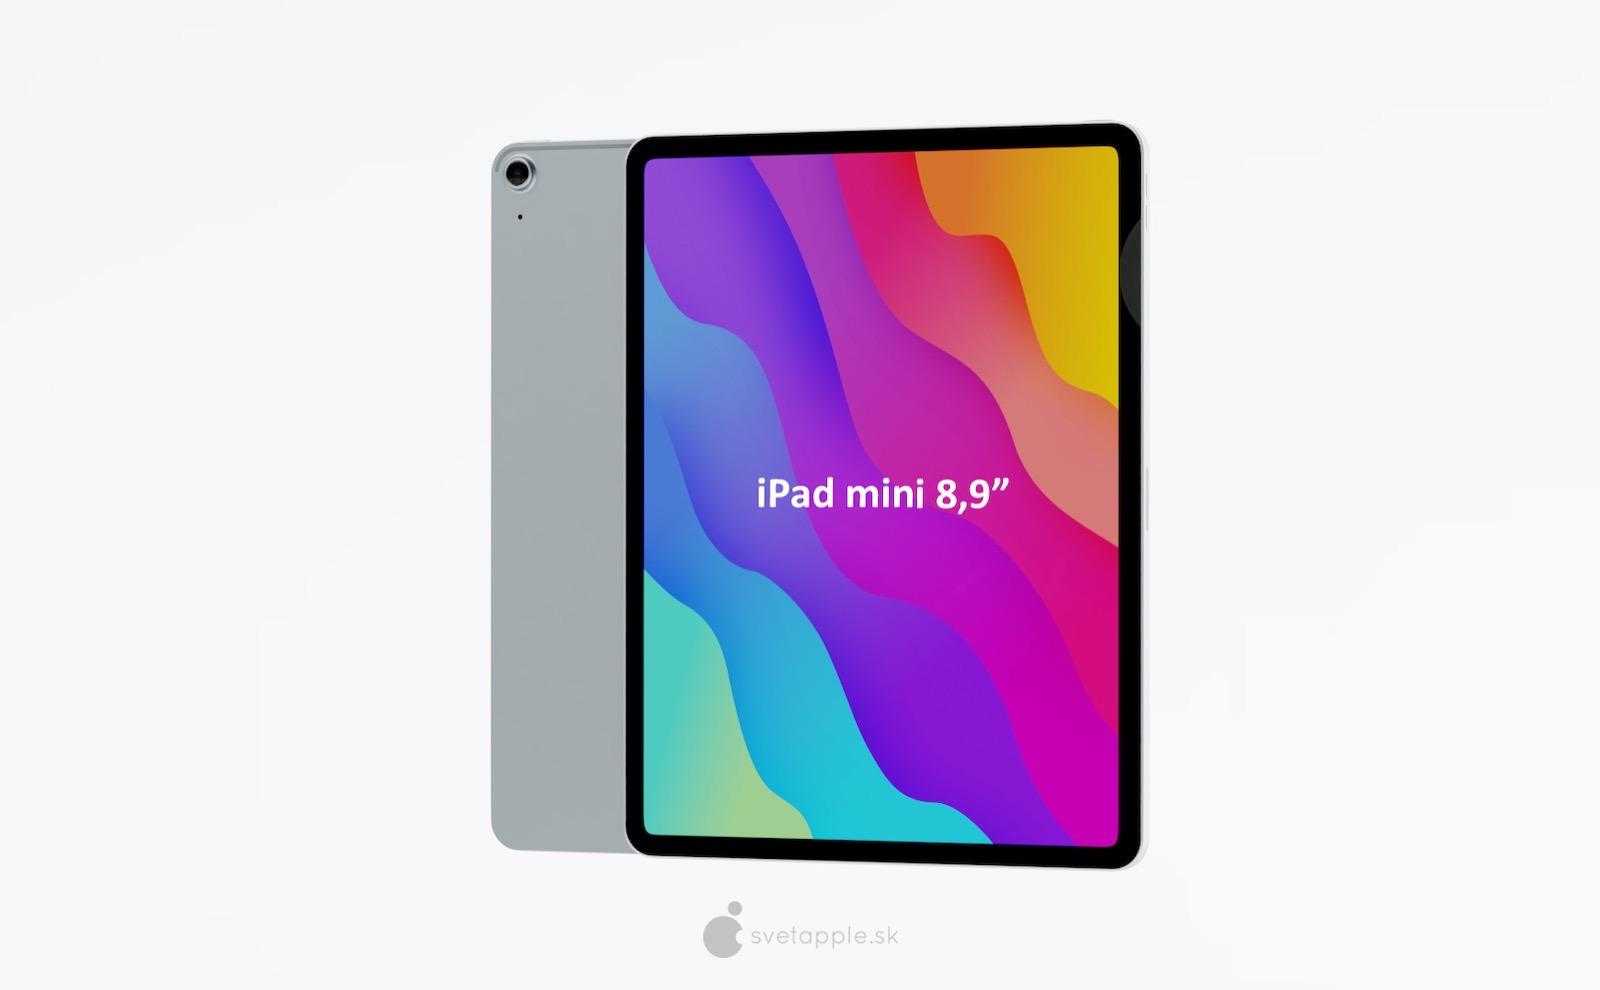 Ipad mini pro concept image 3